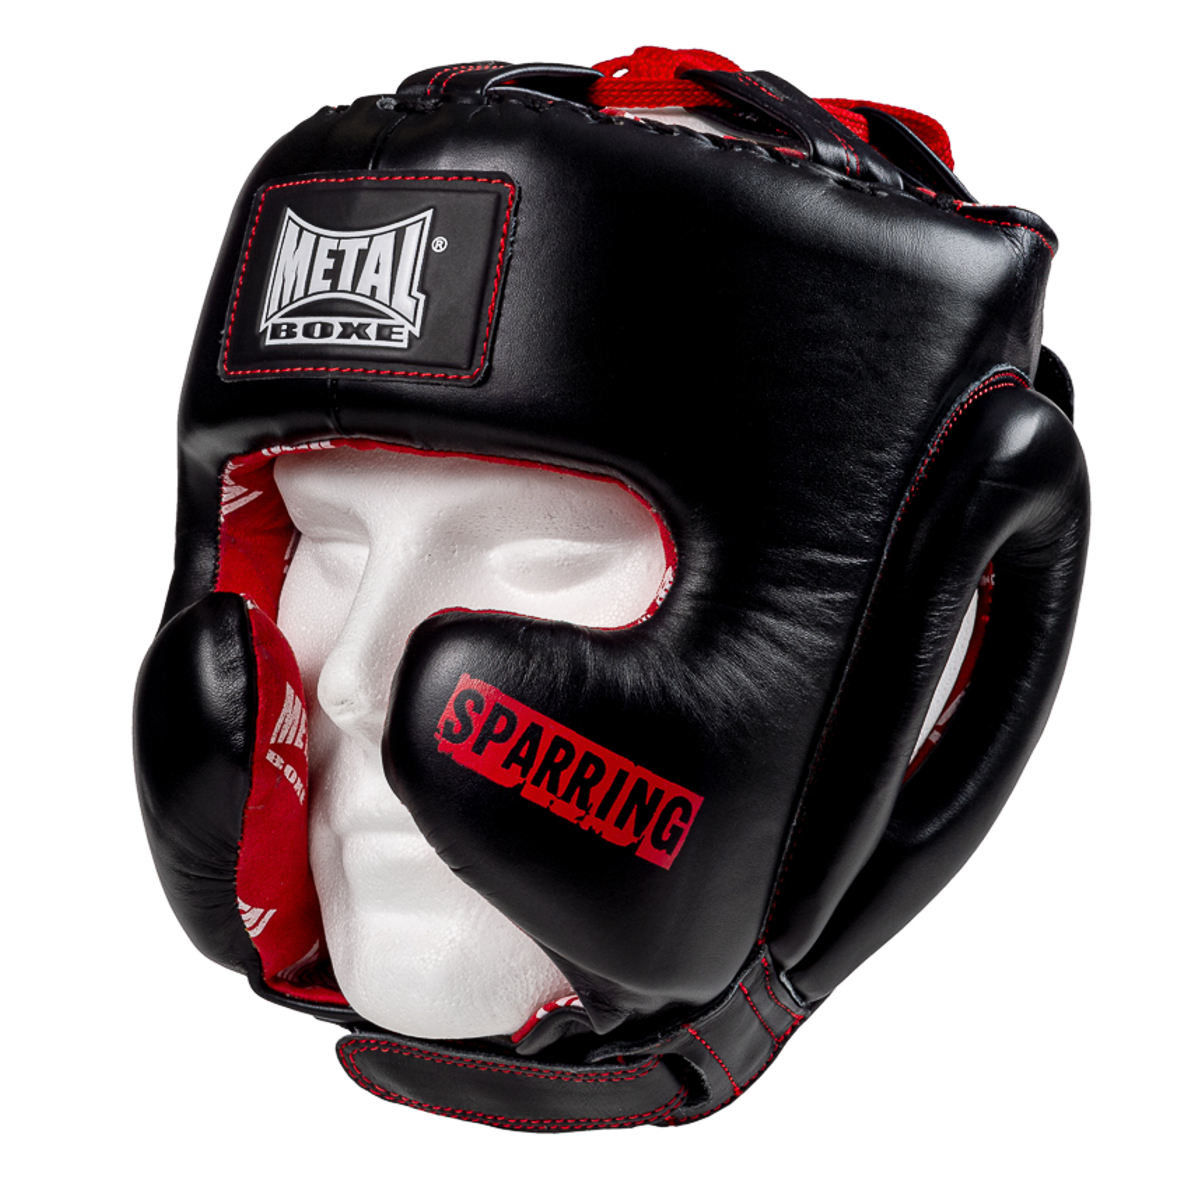 Casque semi intégral Métal boxe sparring